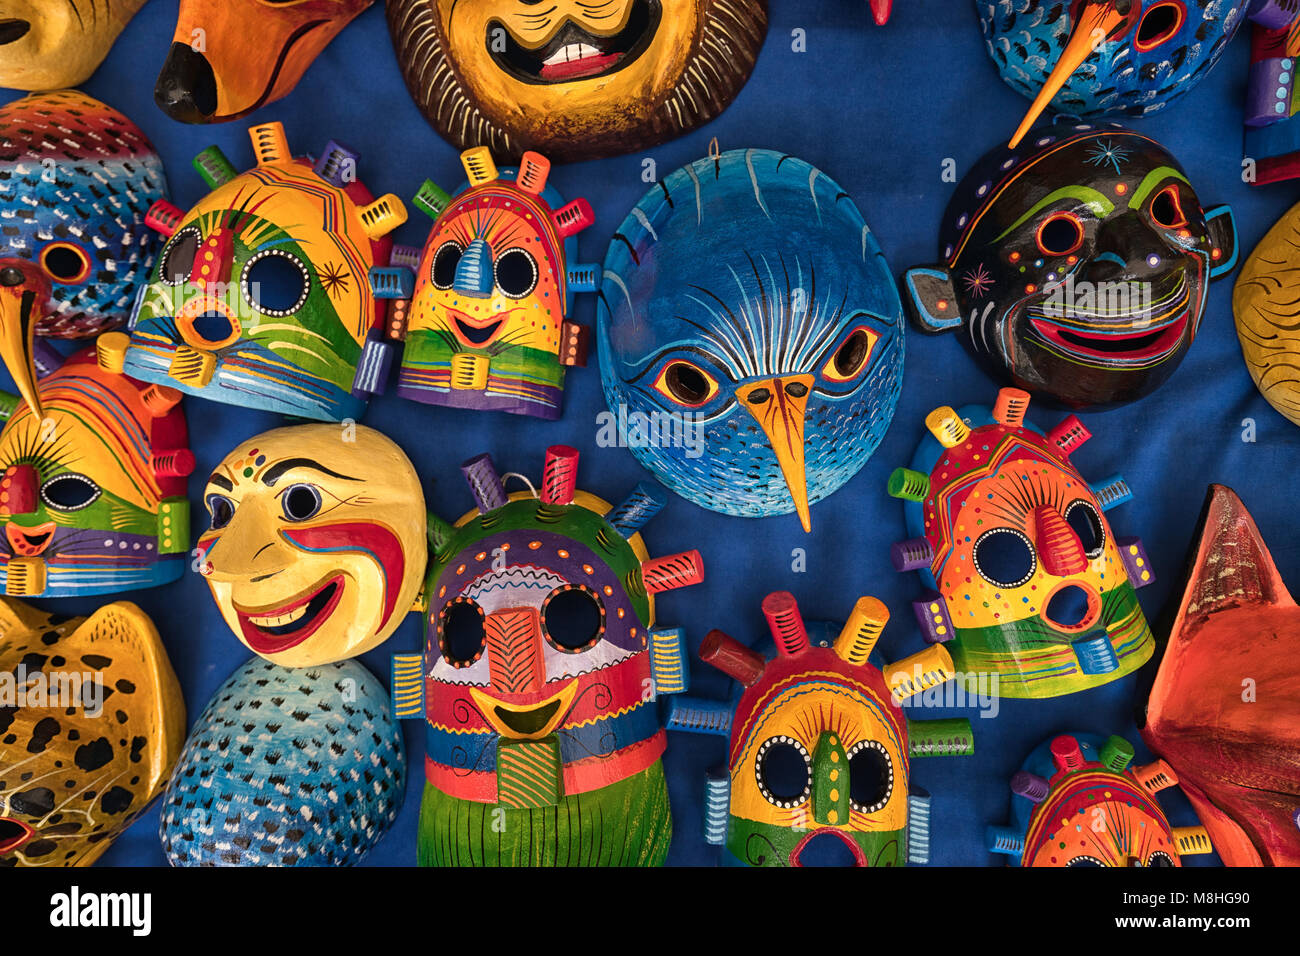 Otavalo, Ecuador - Marzo 3, 2018: Primer plano de coloridas esculturas de madera autóctona para la venta en Imagen De Stock